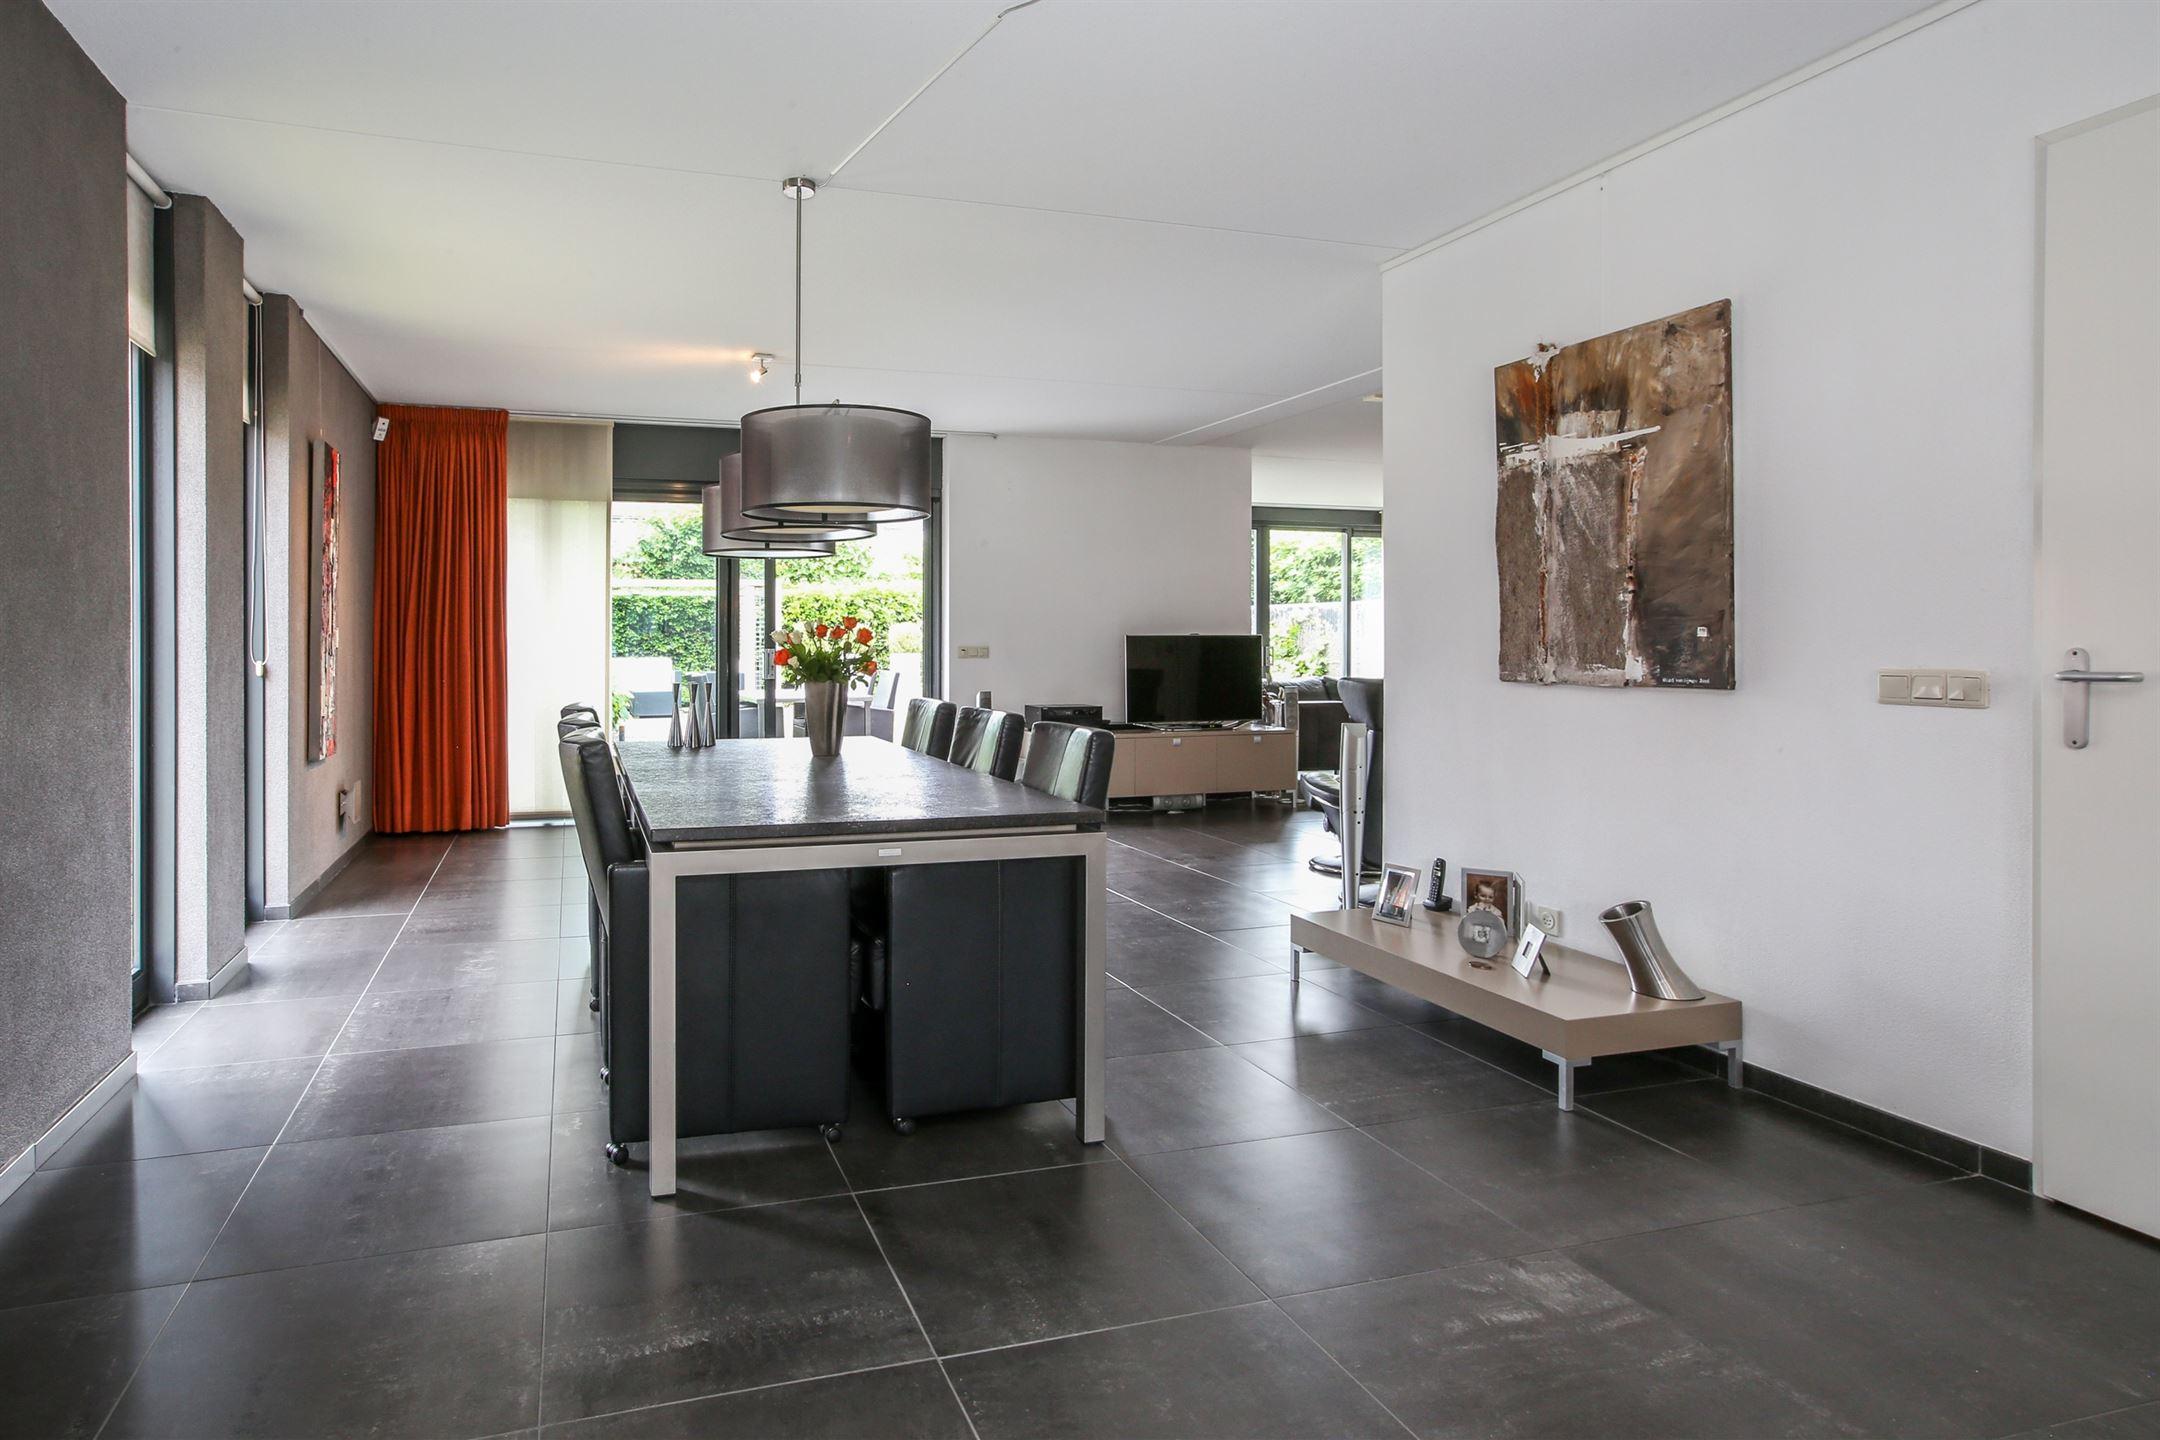 Verkocht villa dotterbloem aa waalwijk funda